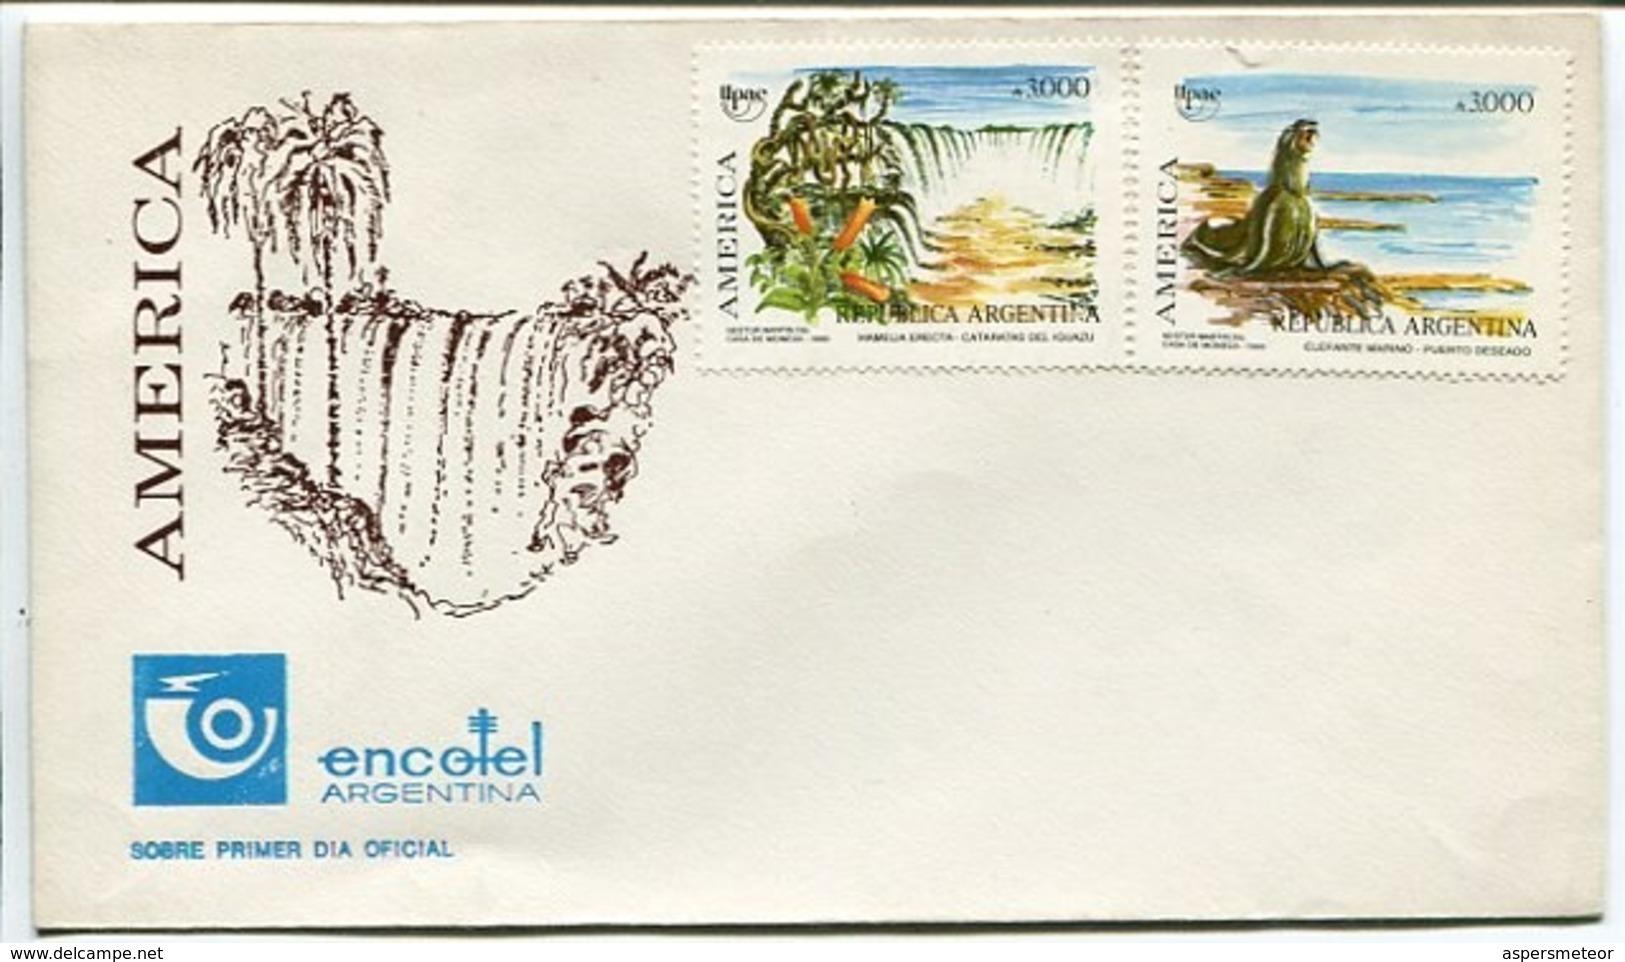 ENCOTEL - AMERICA . ARGENTINA 1990 SOBRE ENVELOPE FDC -LILHU - Vacaciones & Turismo